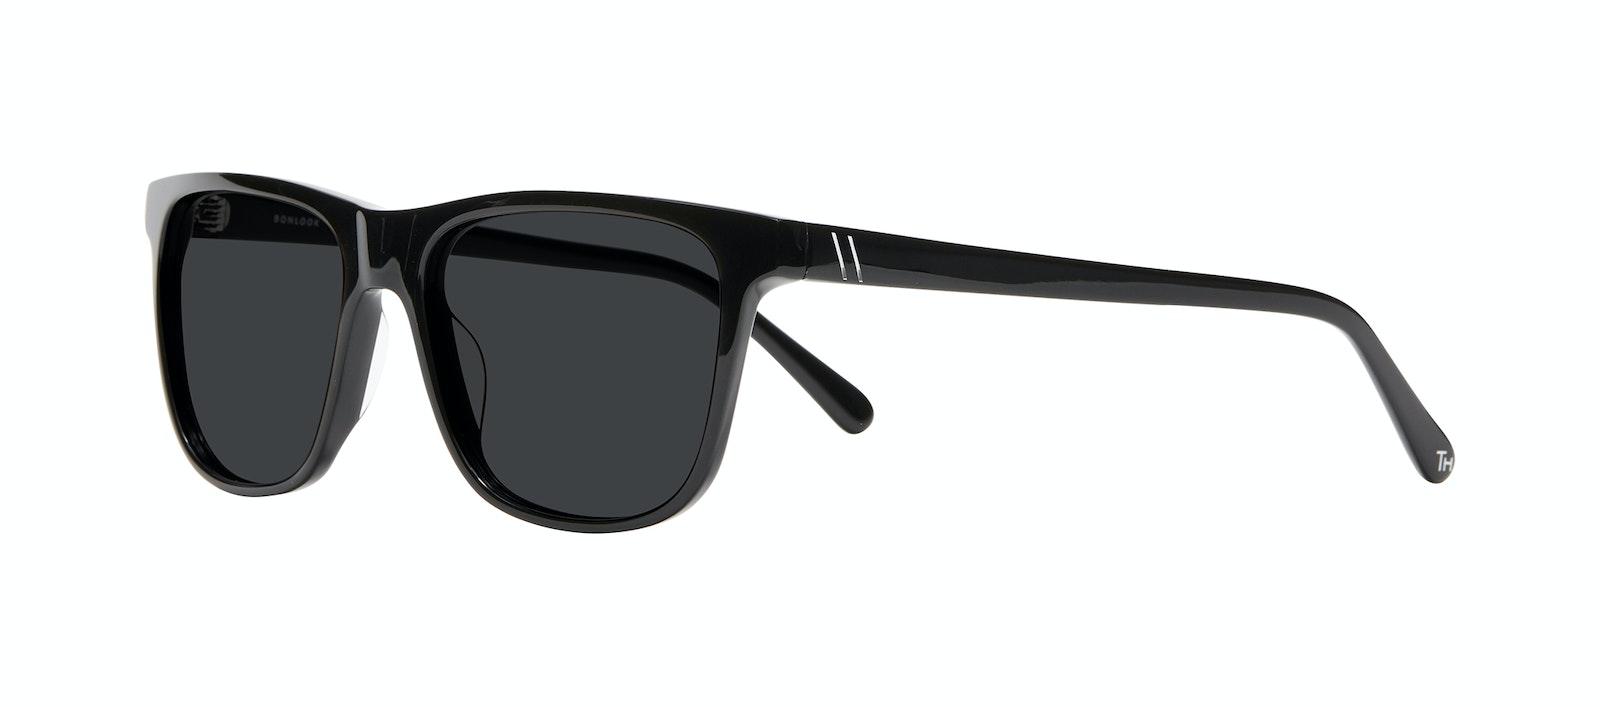 Affordable Fashion Glasses Square Sunglasses Men River Black Tilt